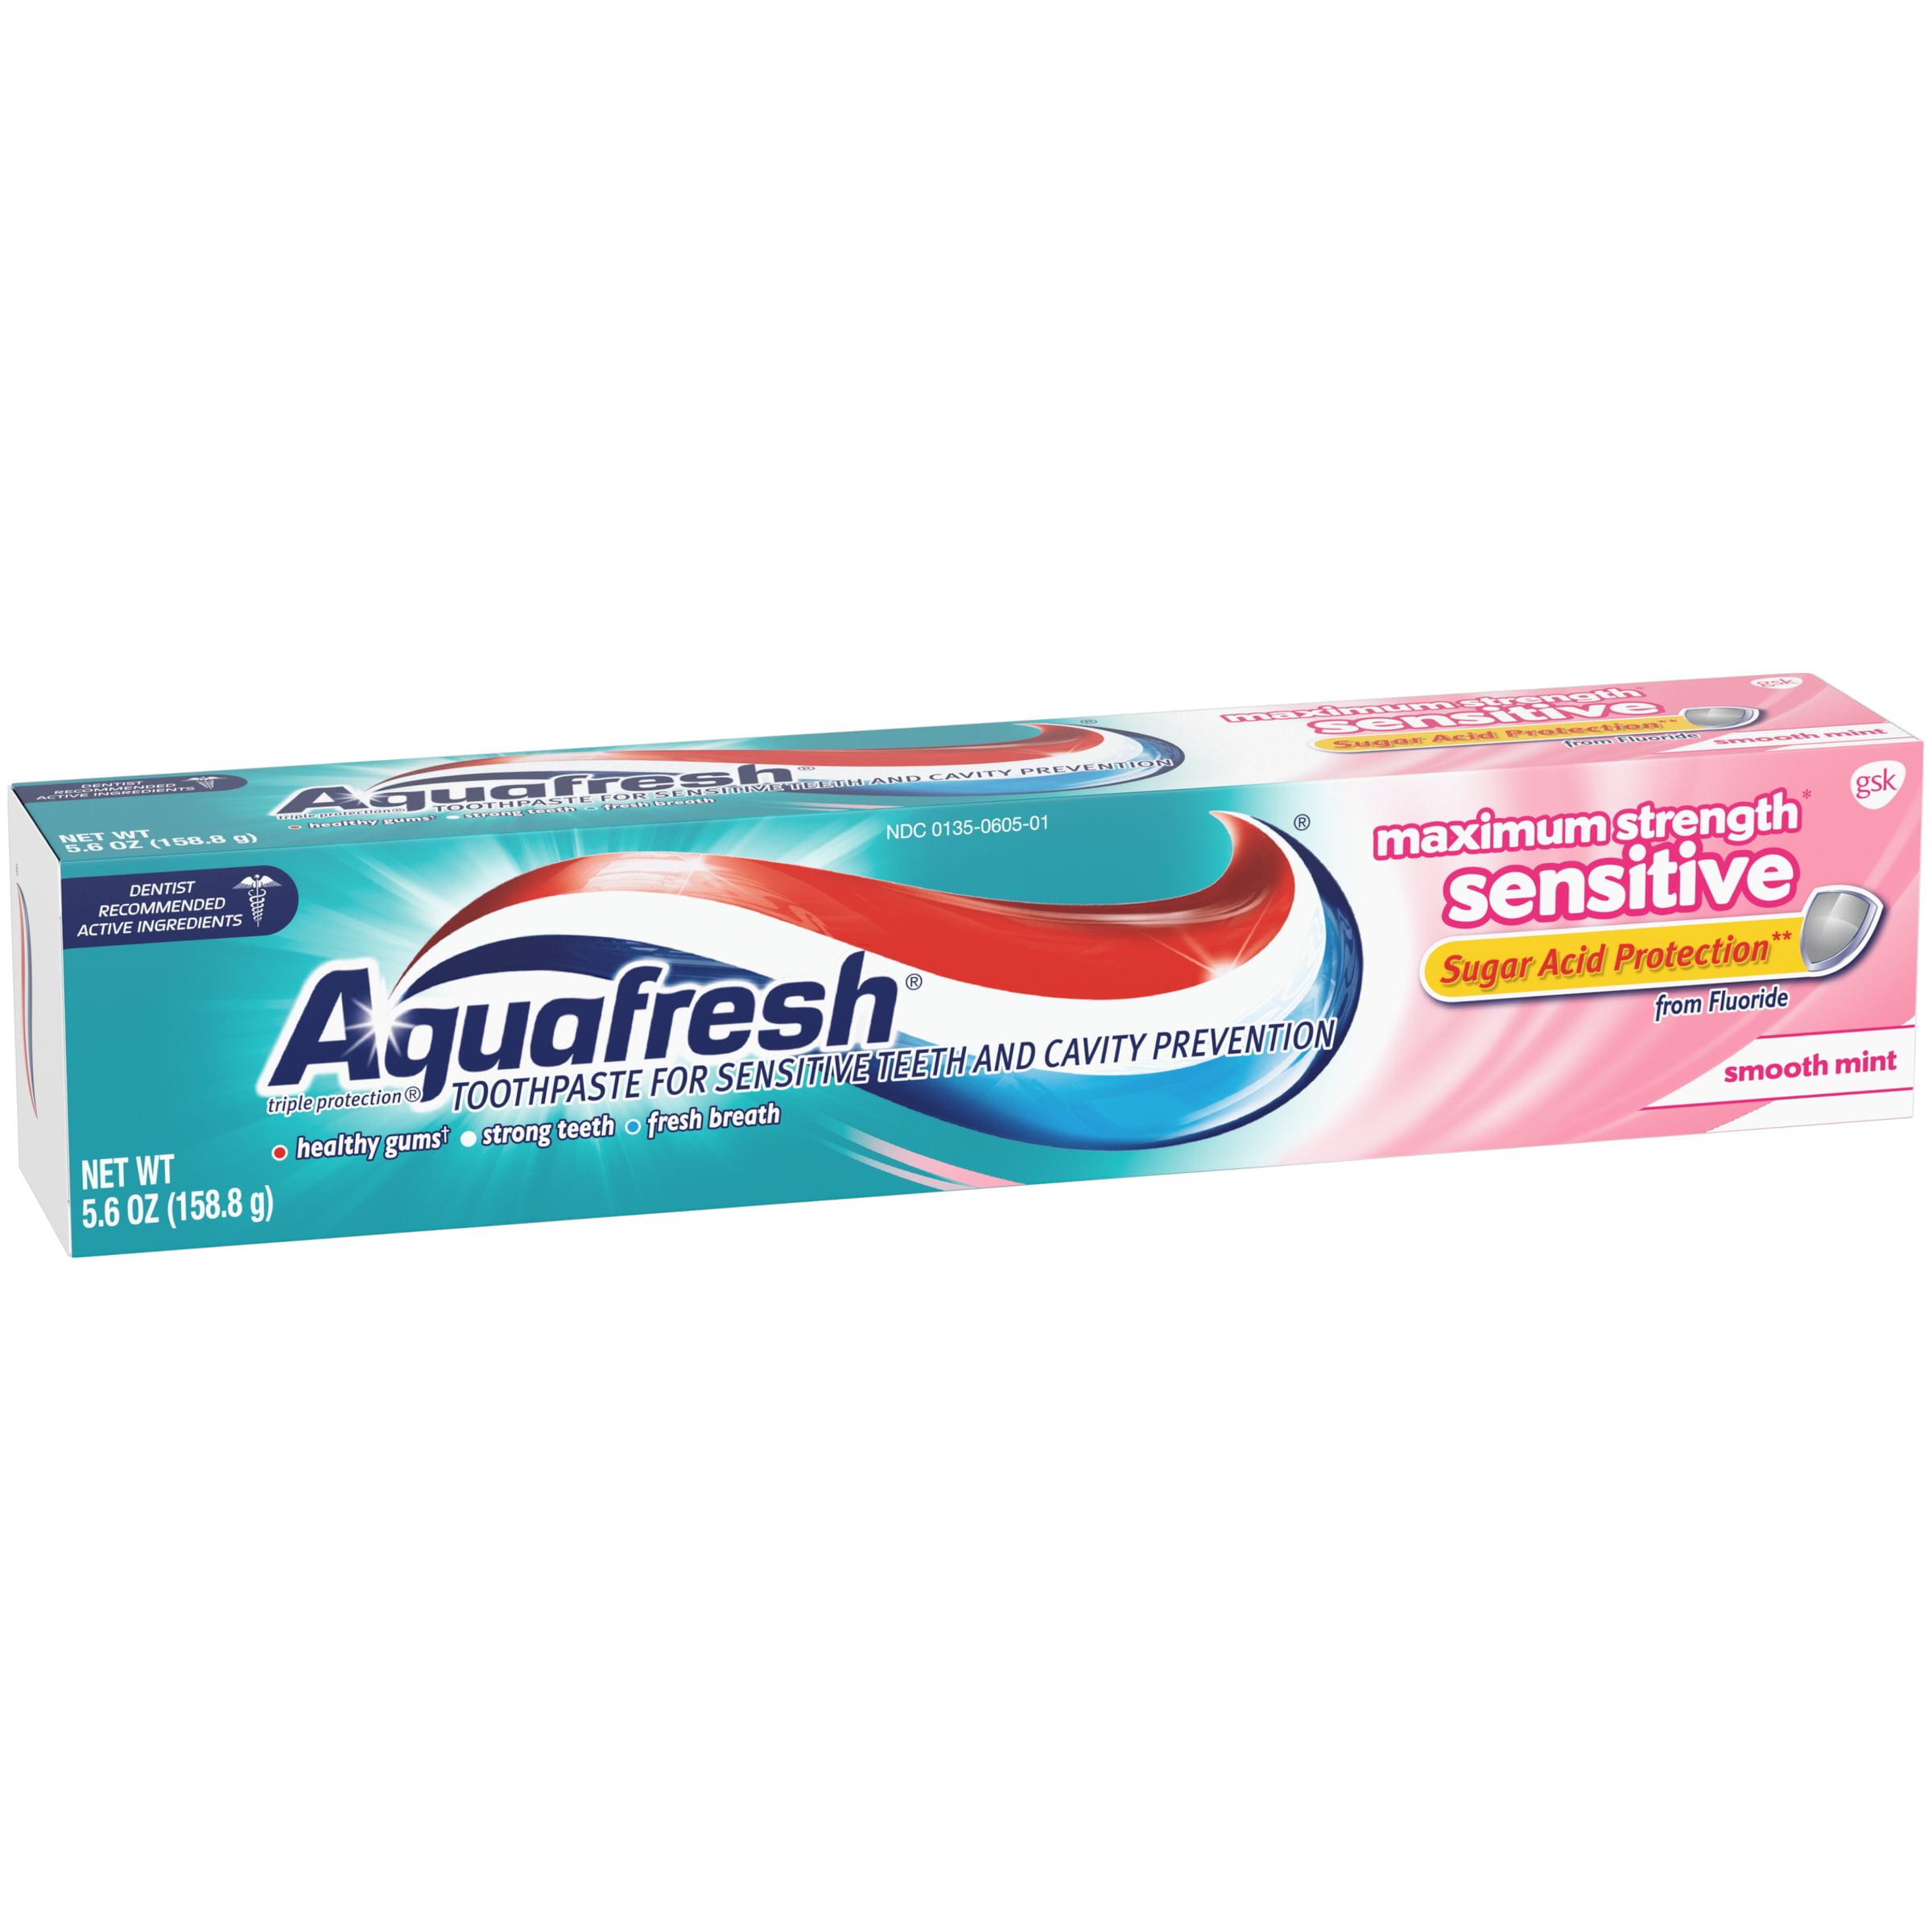 Aquafresh Maximum Strength* Sensitive Smooth Mint Toothpaste 5.6 oz. Box